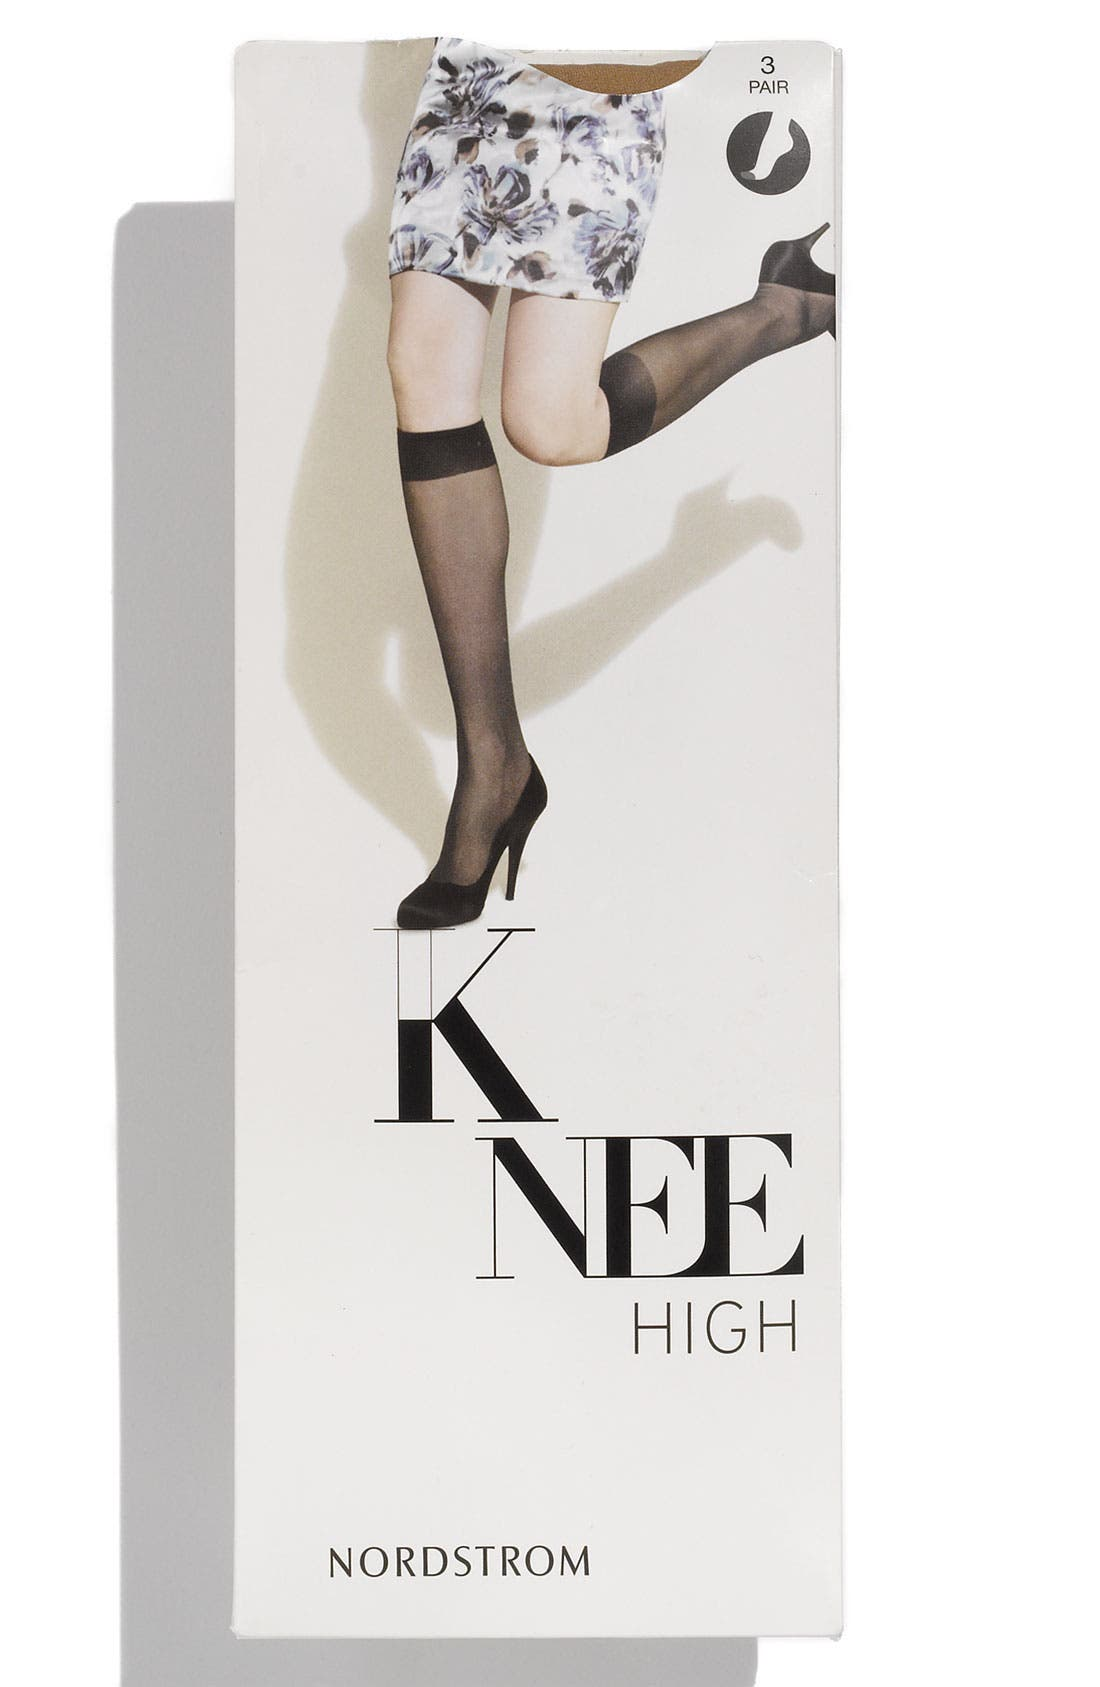 Alternate Image 1 Selected - Nordstrom Sheer Knee High Stockings with Reinforced Toe (3-Pack)